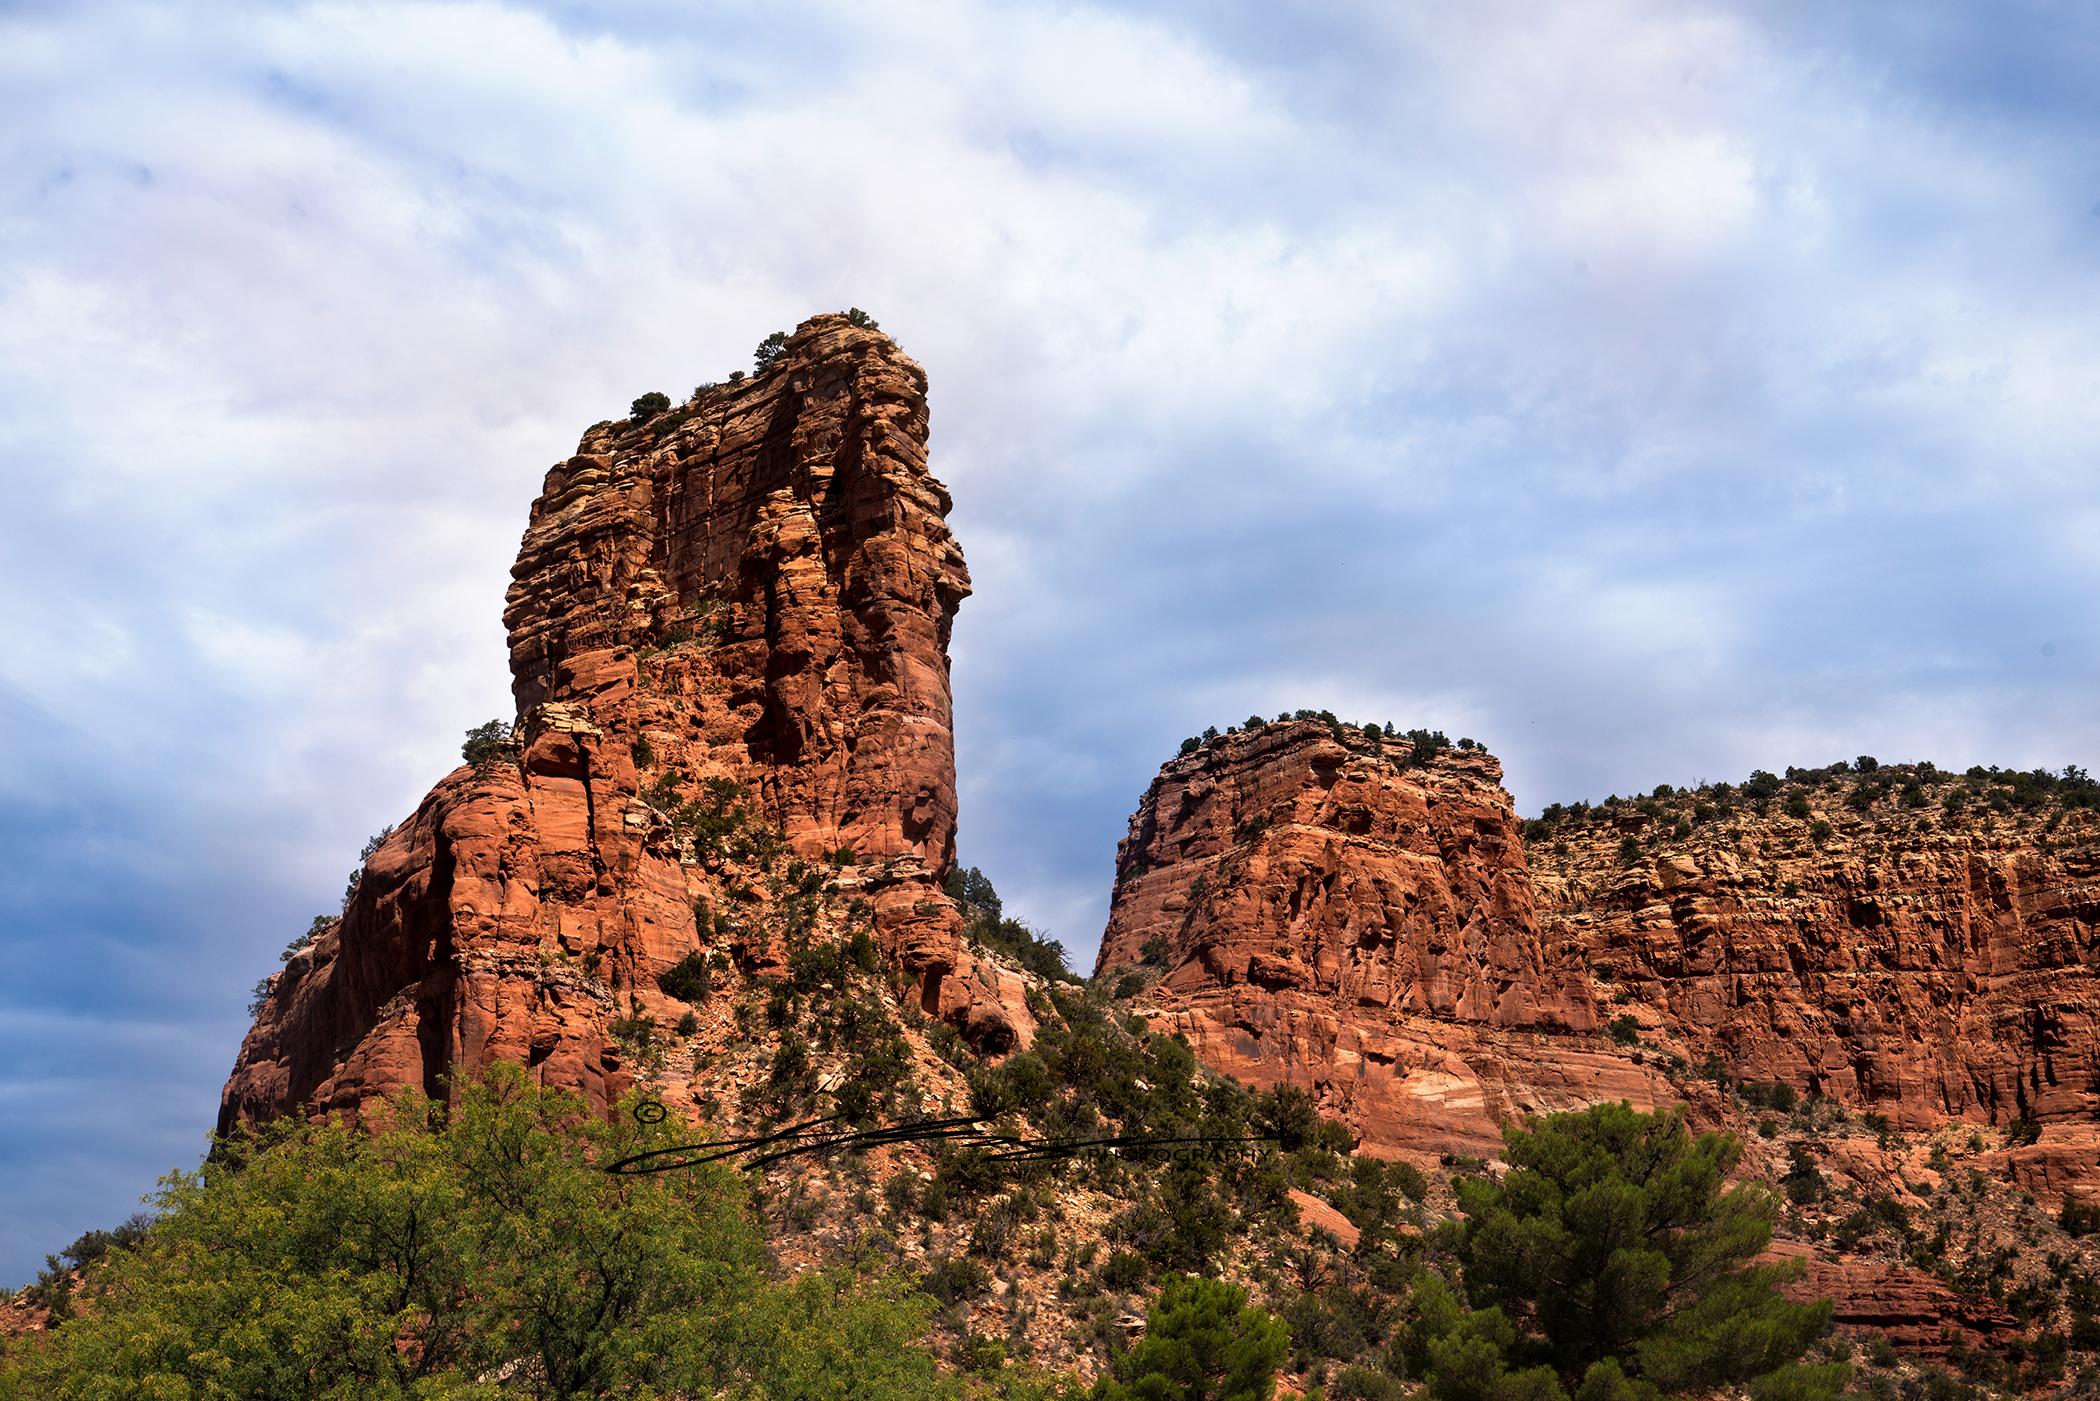 Sedona_Scenecroute_Arizona_Cathedralrock_travelphotography_jbogerphotography (1).jpg